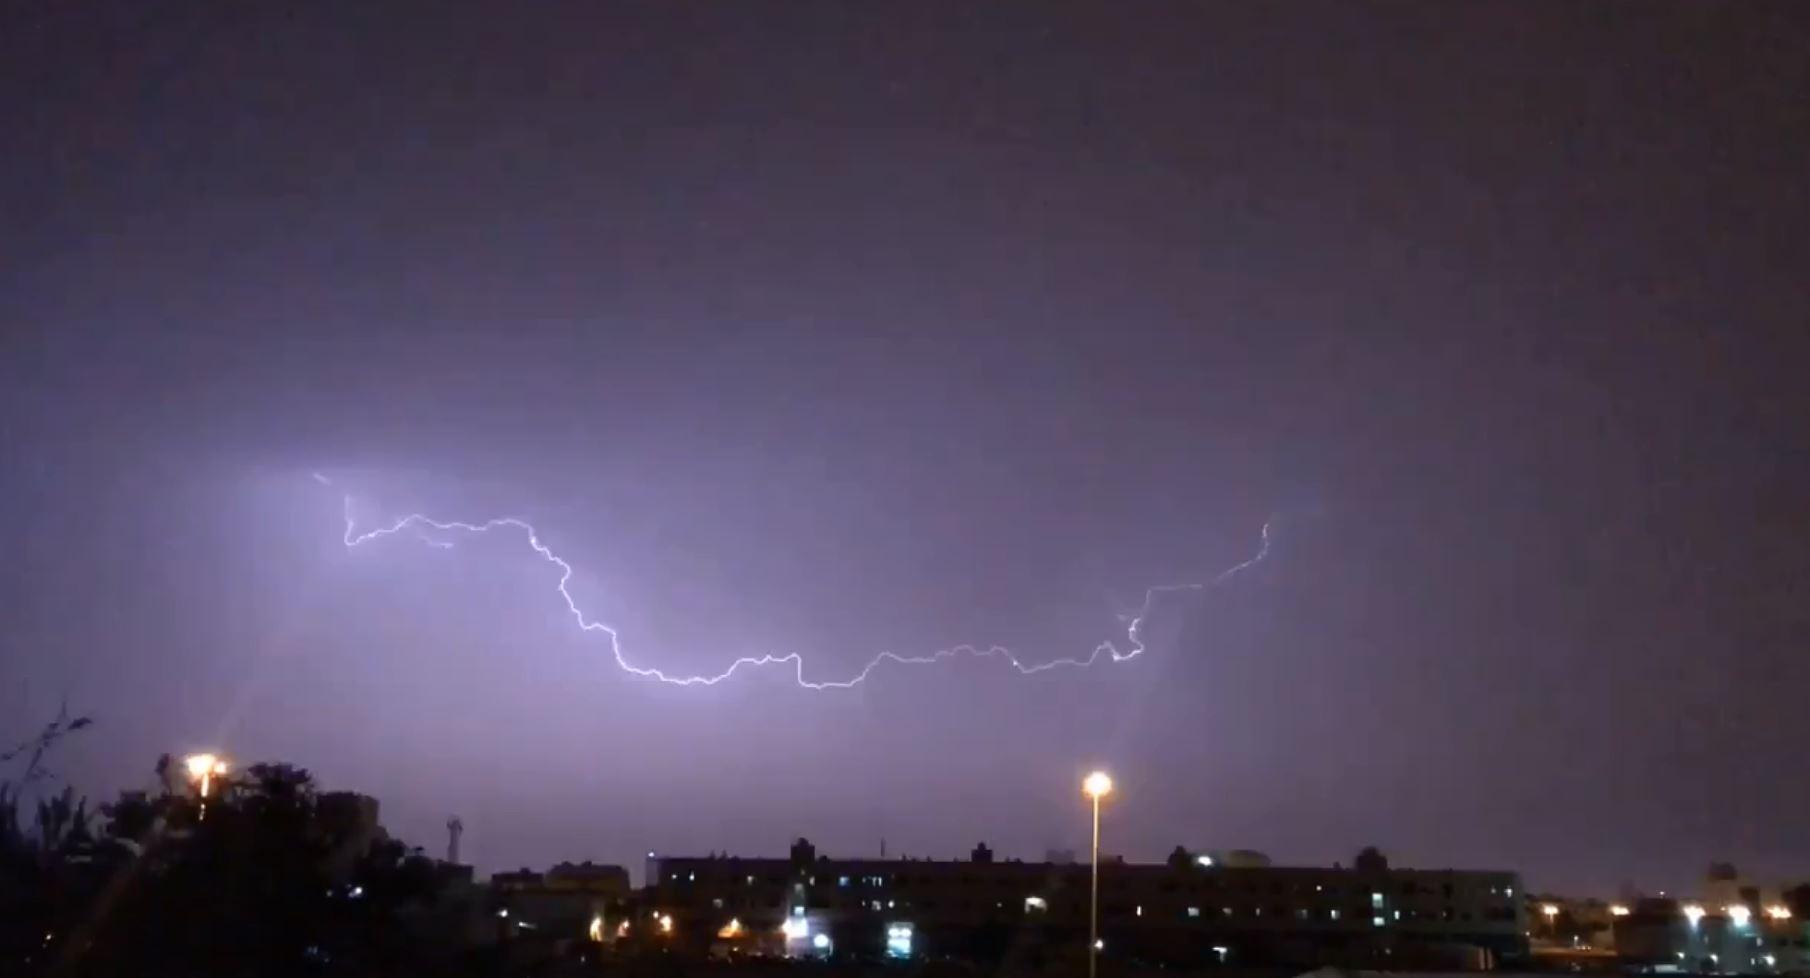 VIDEO: More rains on way...